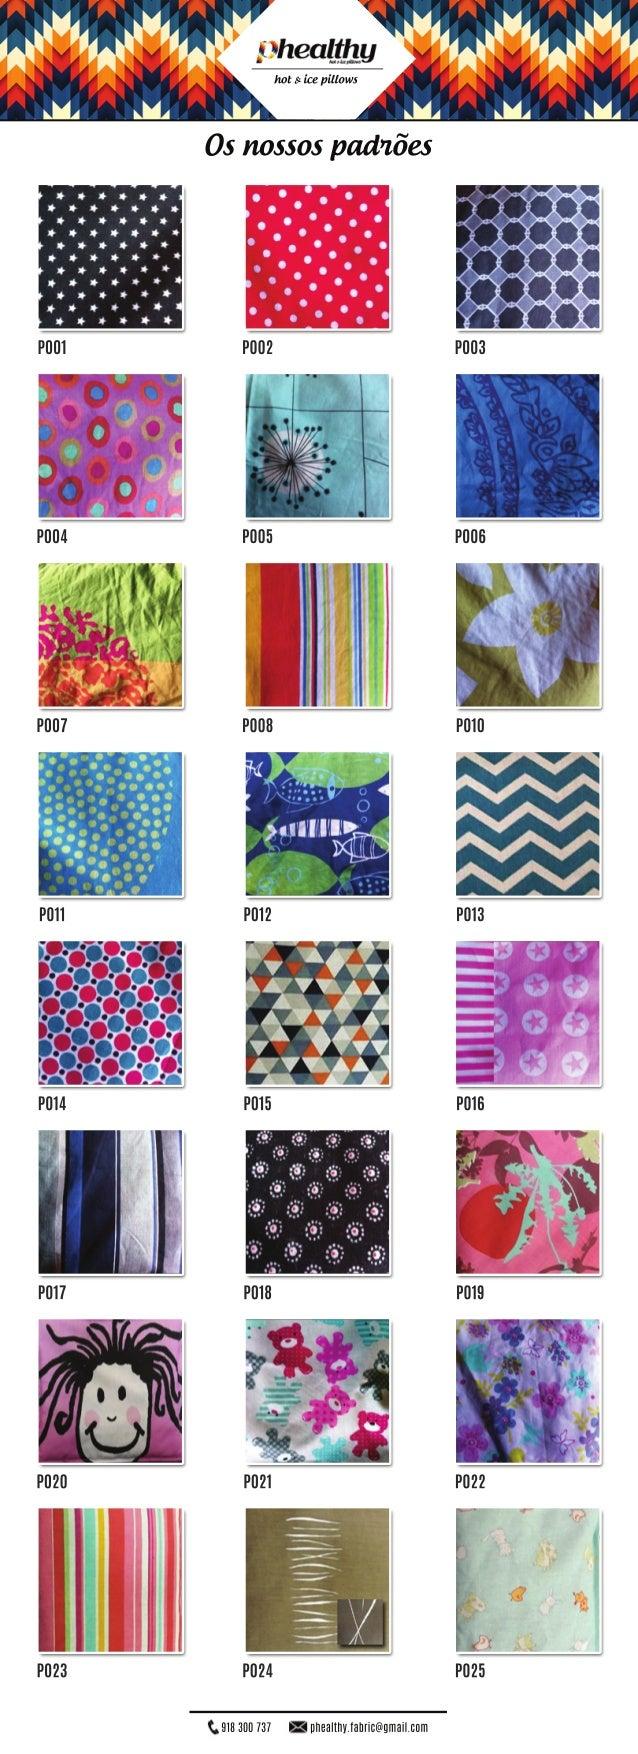 hot&icepillows 918300737 phealthy.fabric@gmail.com Osnossospadrões P001 P002 P003 P004 P005 P006 P007 P008 P010 P011 P012 ...